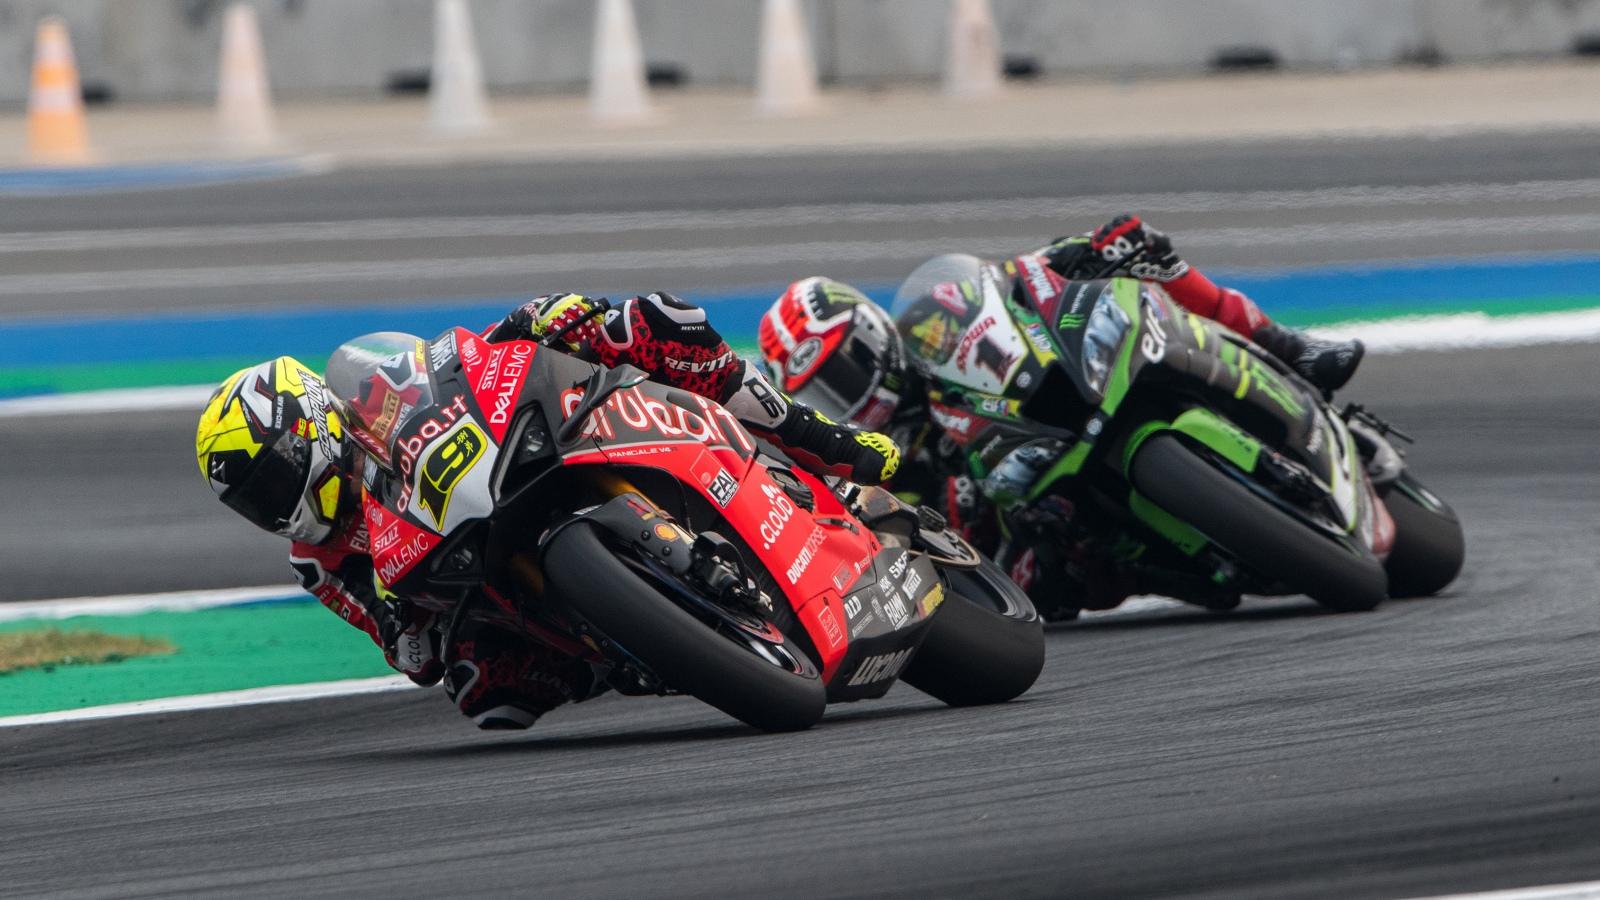 Álvaro Bautista vs Jonathan Rea, ¿dónde se decidirá el Mundial de Superbike 2019?